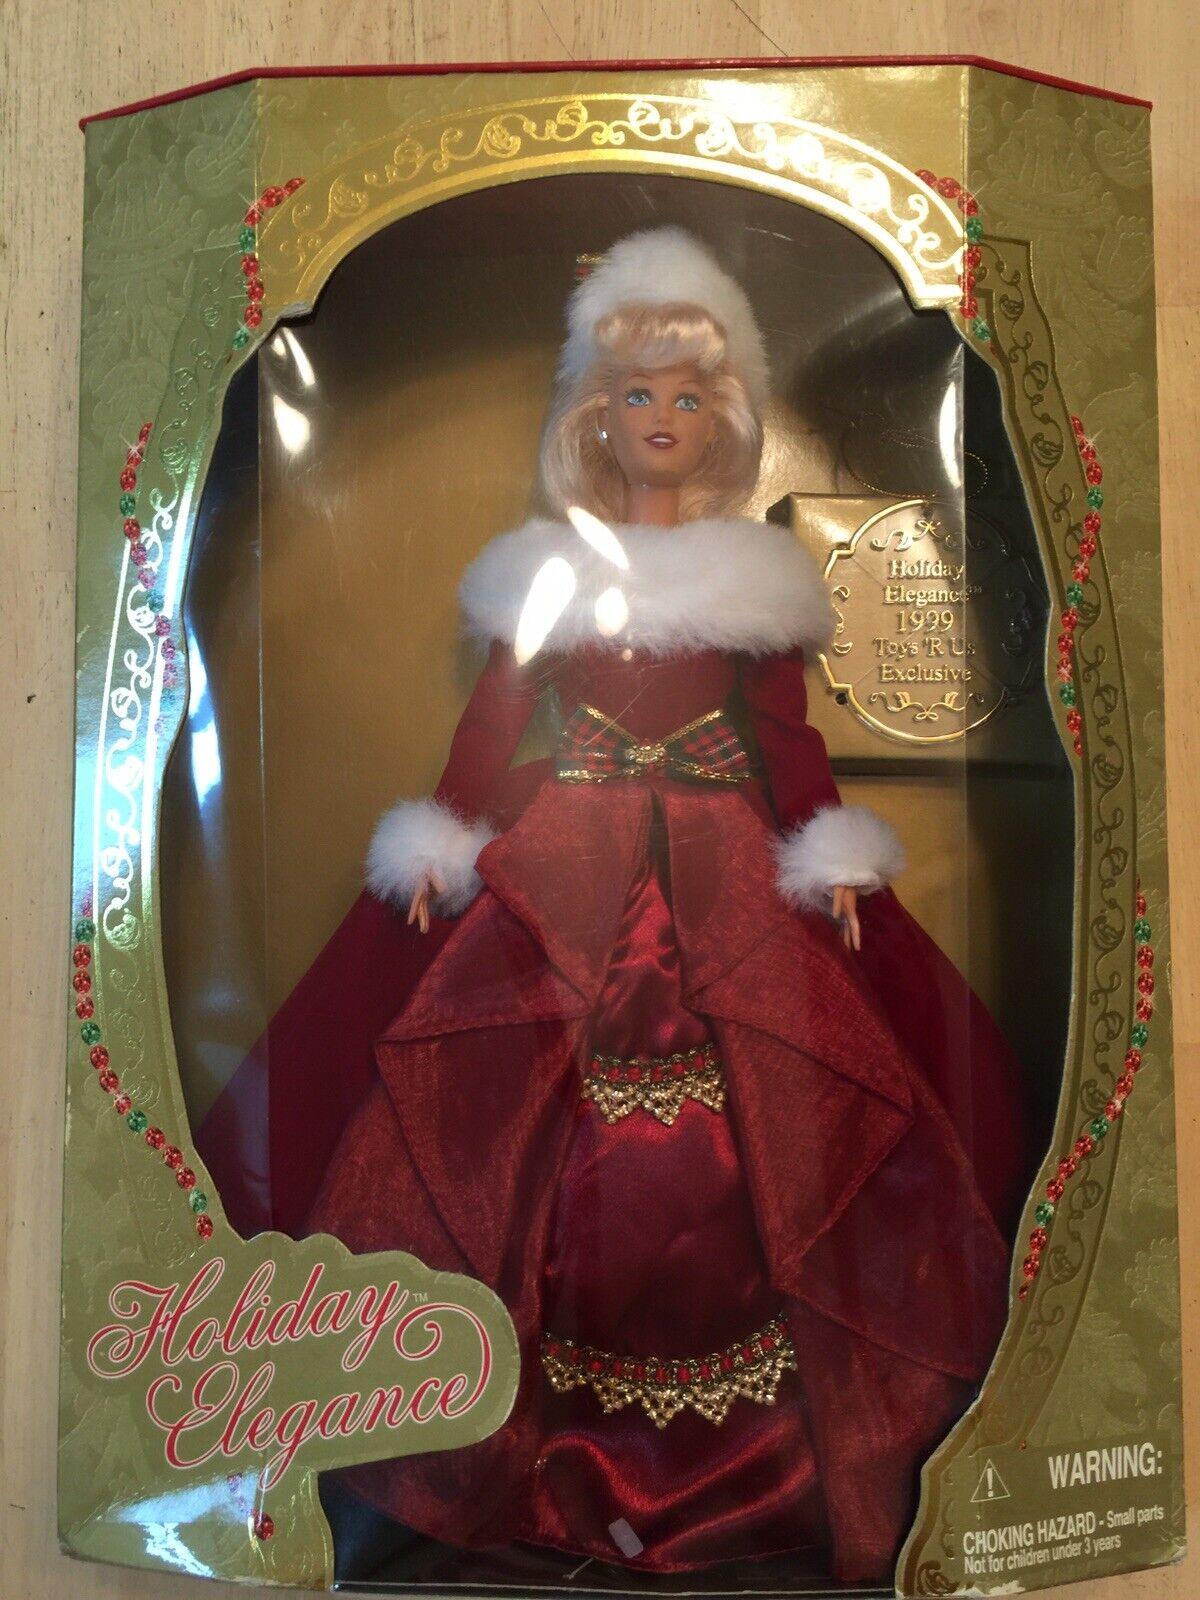 Jakks Pacific, Inc. 1999 Holiday Elegance Toys R Us Exclusive Doll Blonde 11391